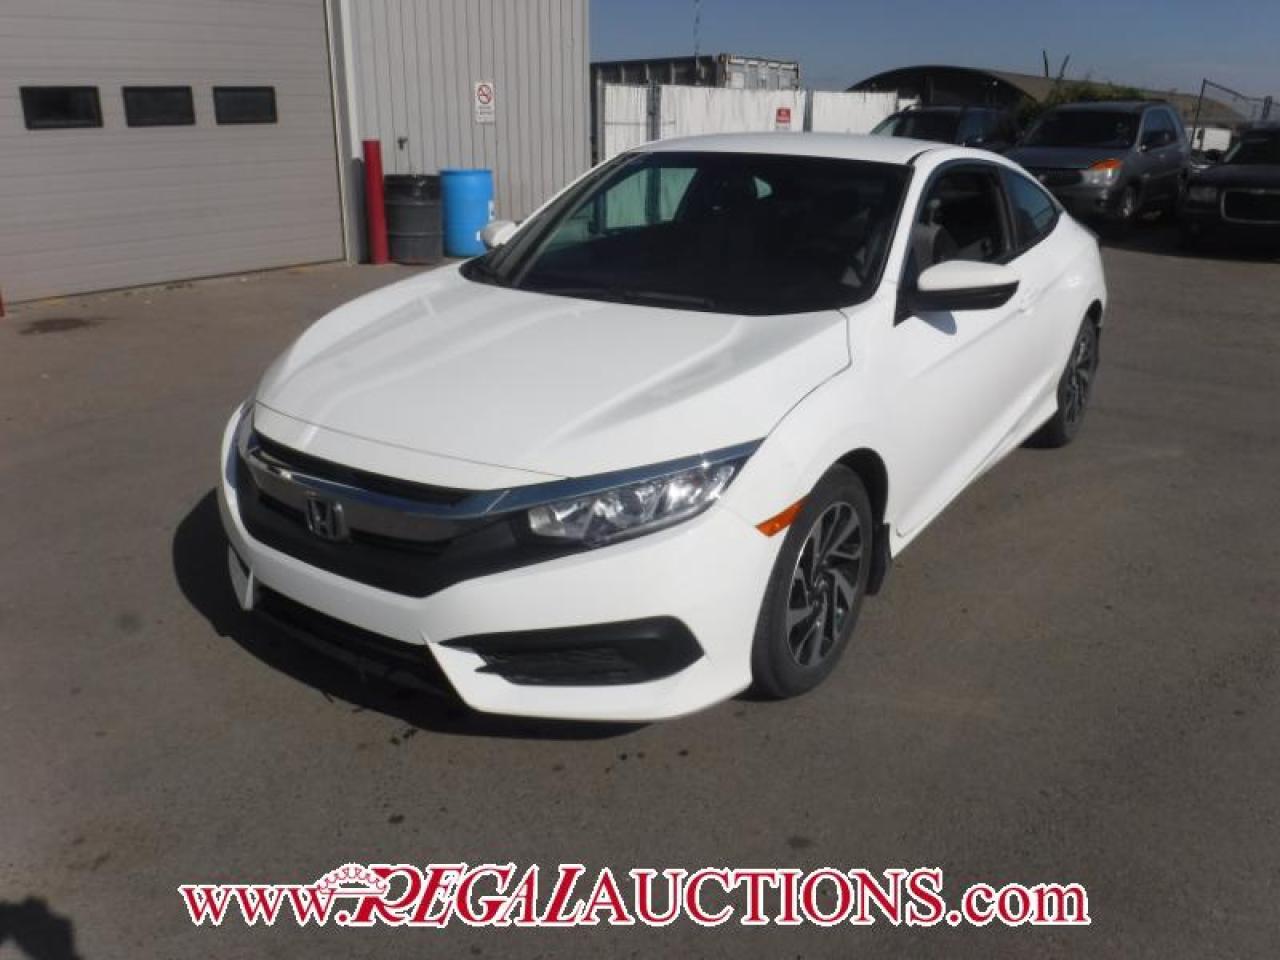 Photo of White 2016 Honda Civic